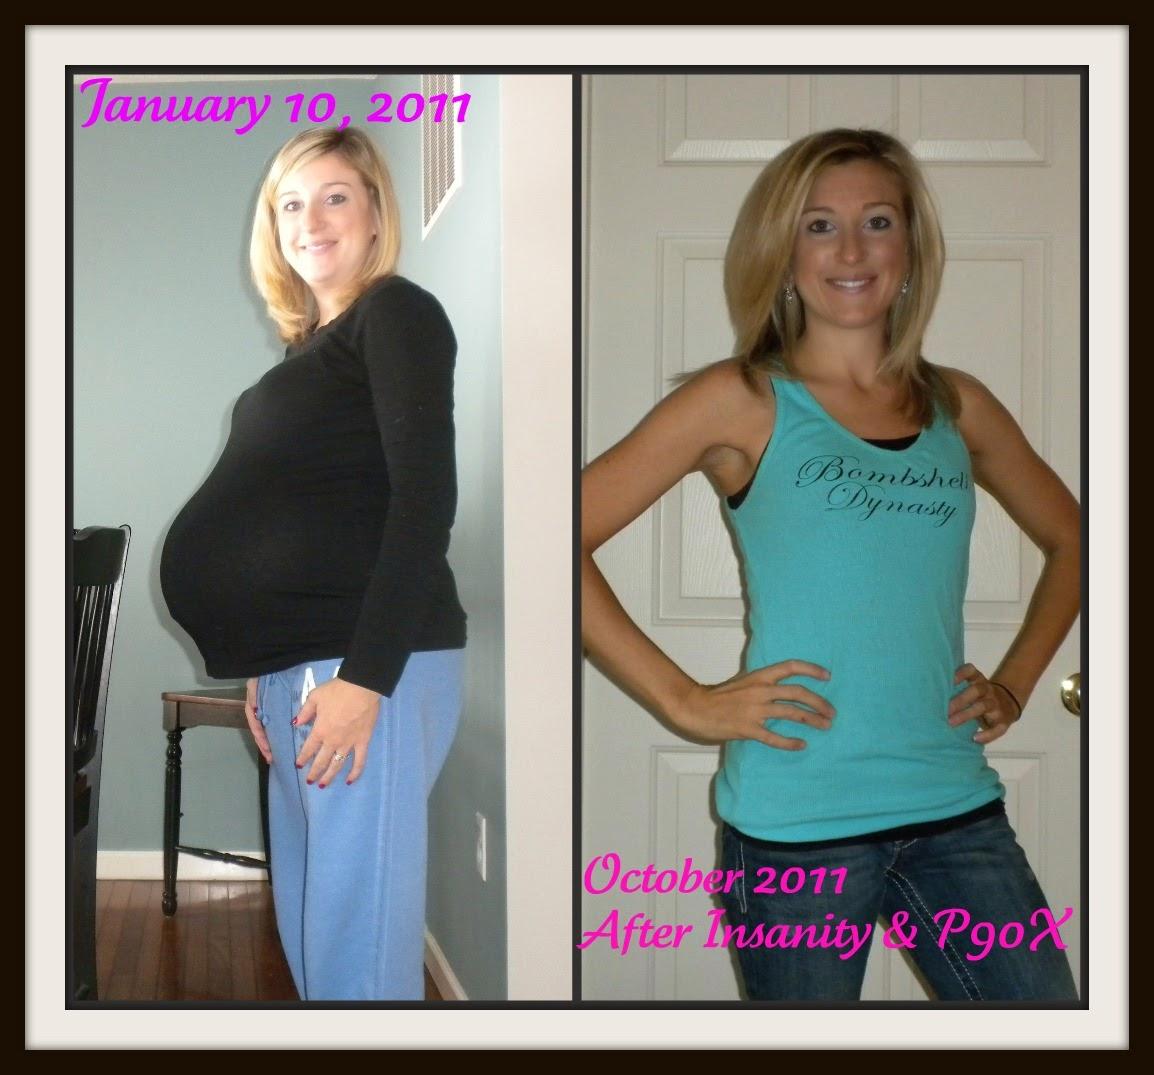 Womens Transformation Pictures, Insanity, Melanie Mitro, P90X, Shakeology, Workouts